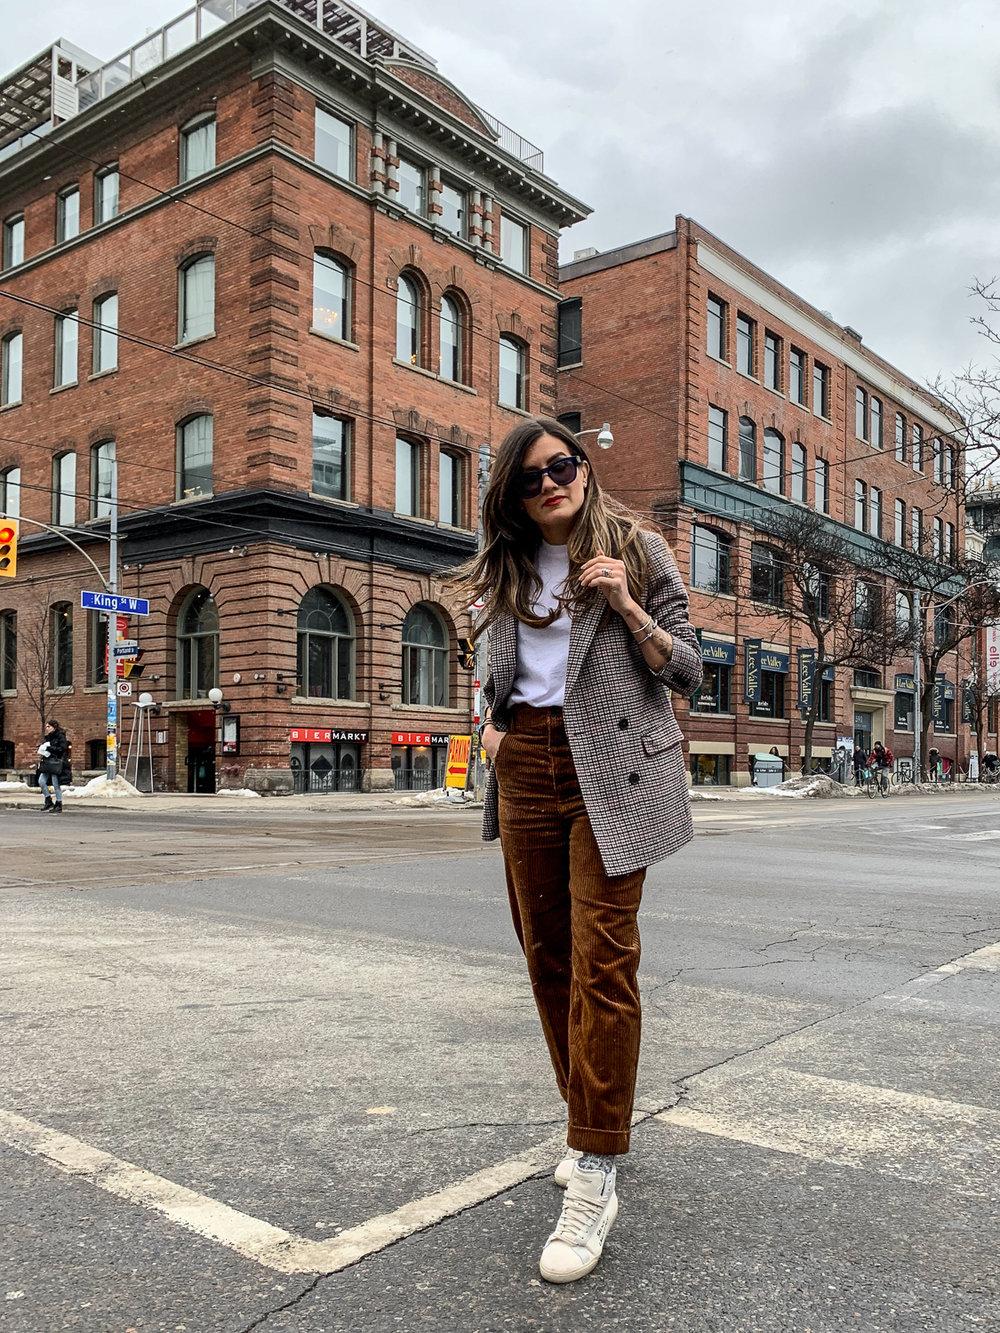 nathalie martin, brown corduroy pants, sandro paris t-shirt, frank and oak brown plaid oversized blazer, saint laurent high top canvas sneakers, woahstyle.com, street style_5183.jpg